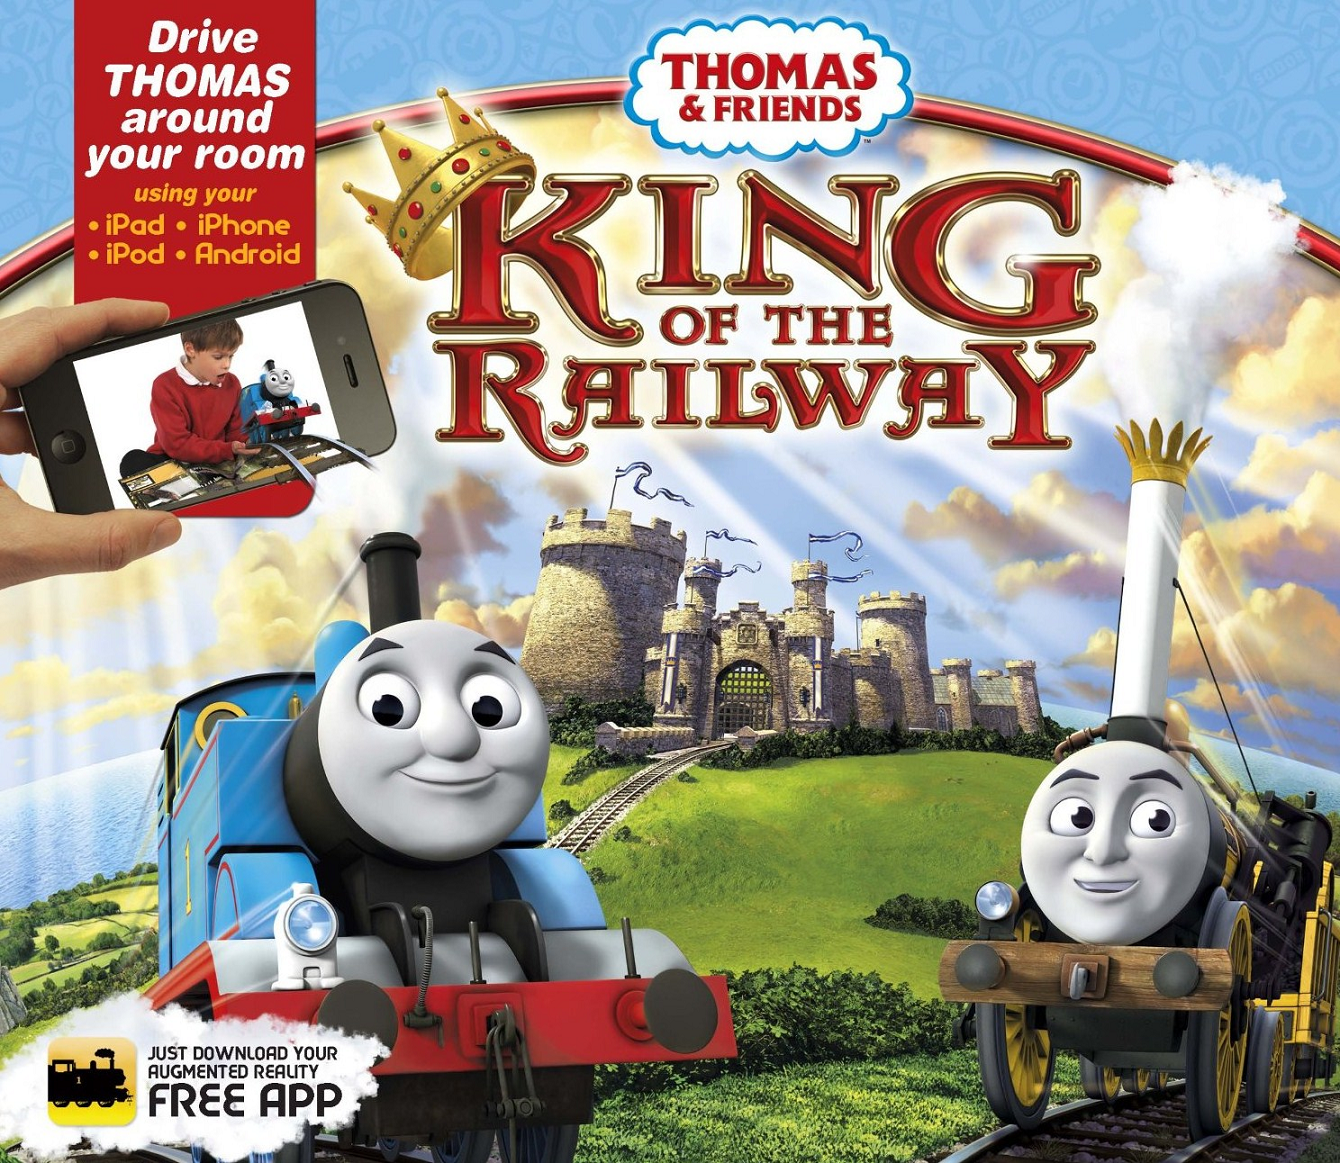 King of the Railway (UK book) | Thomas the Tank Engine ...